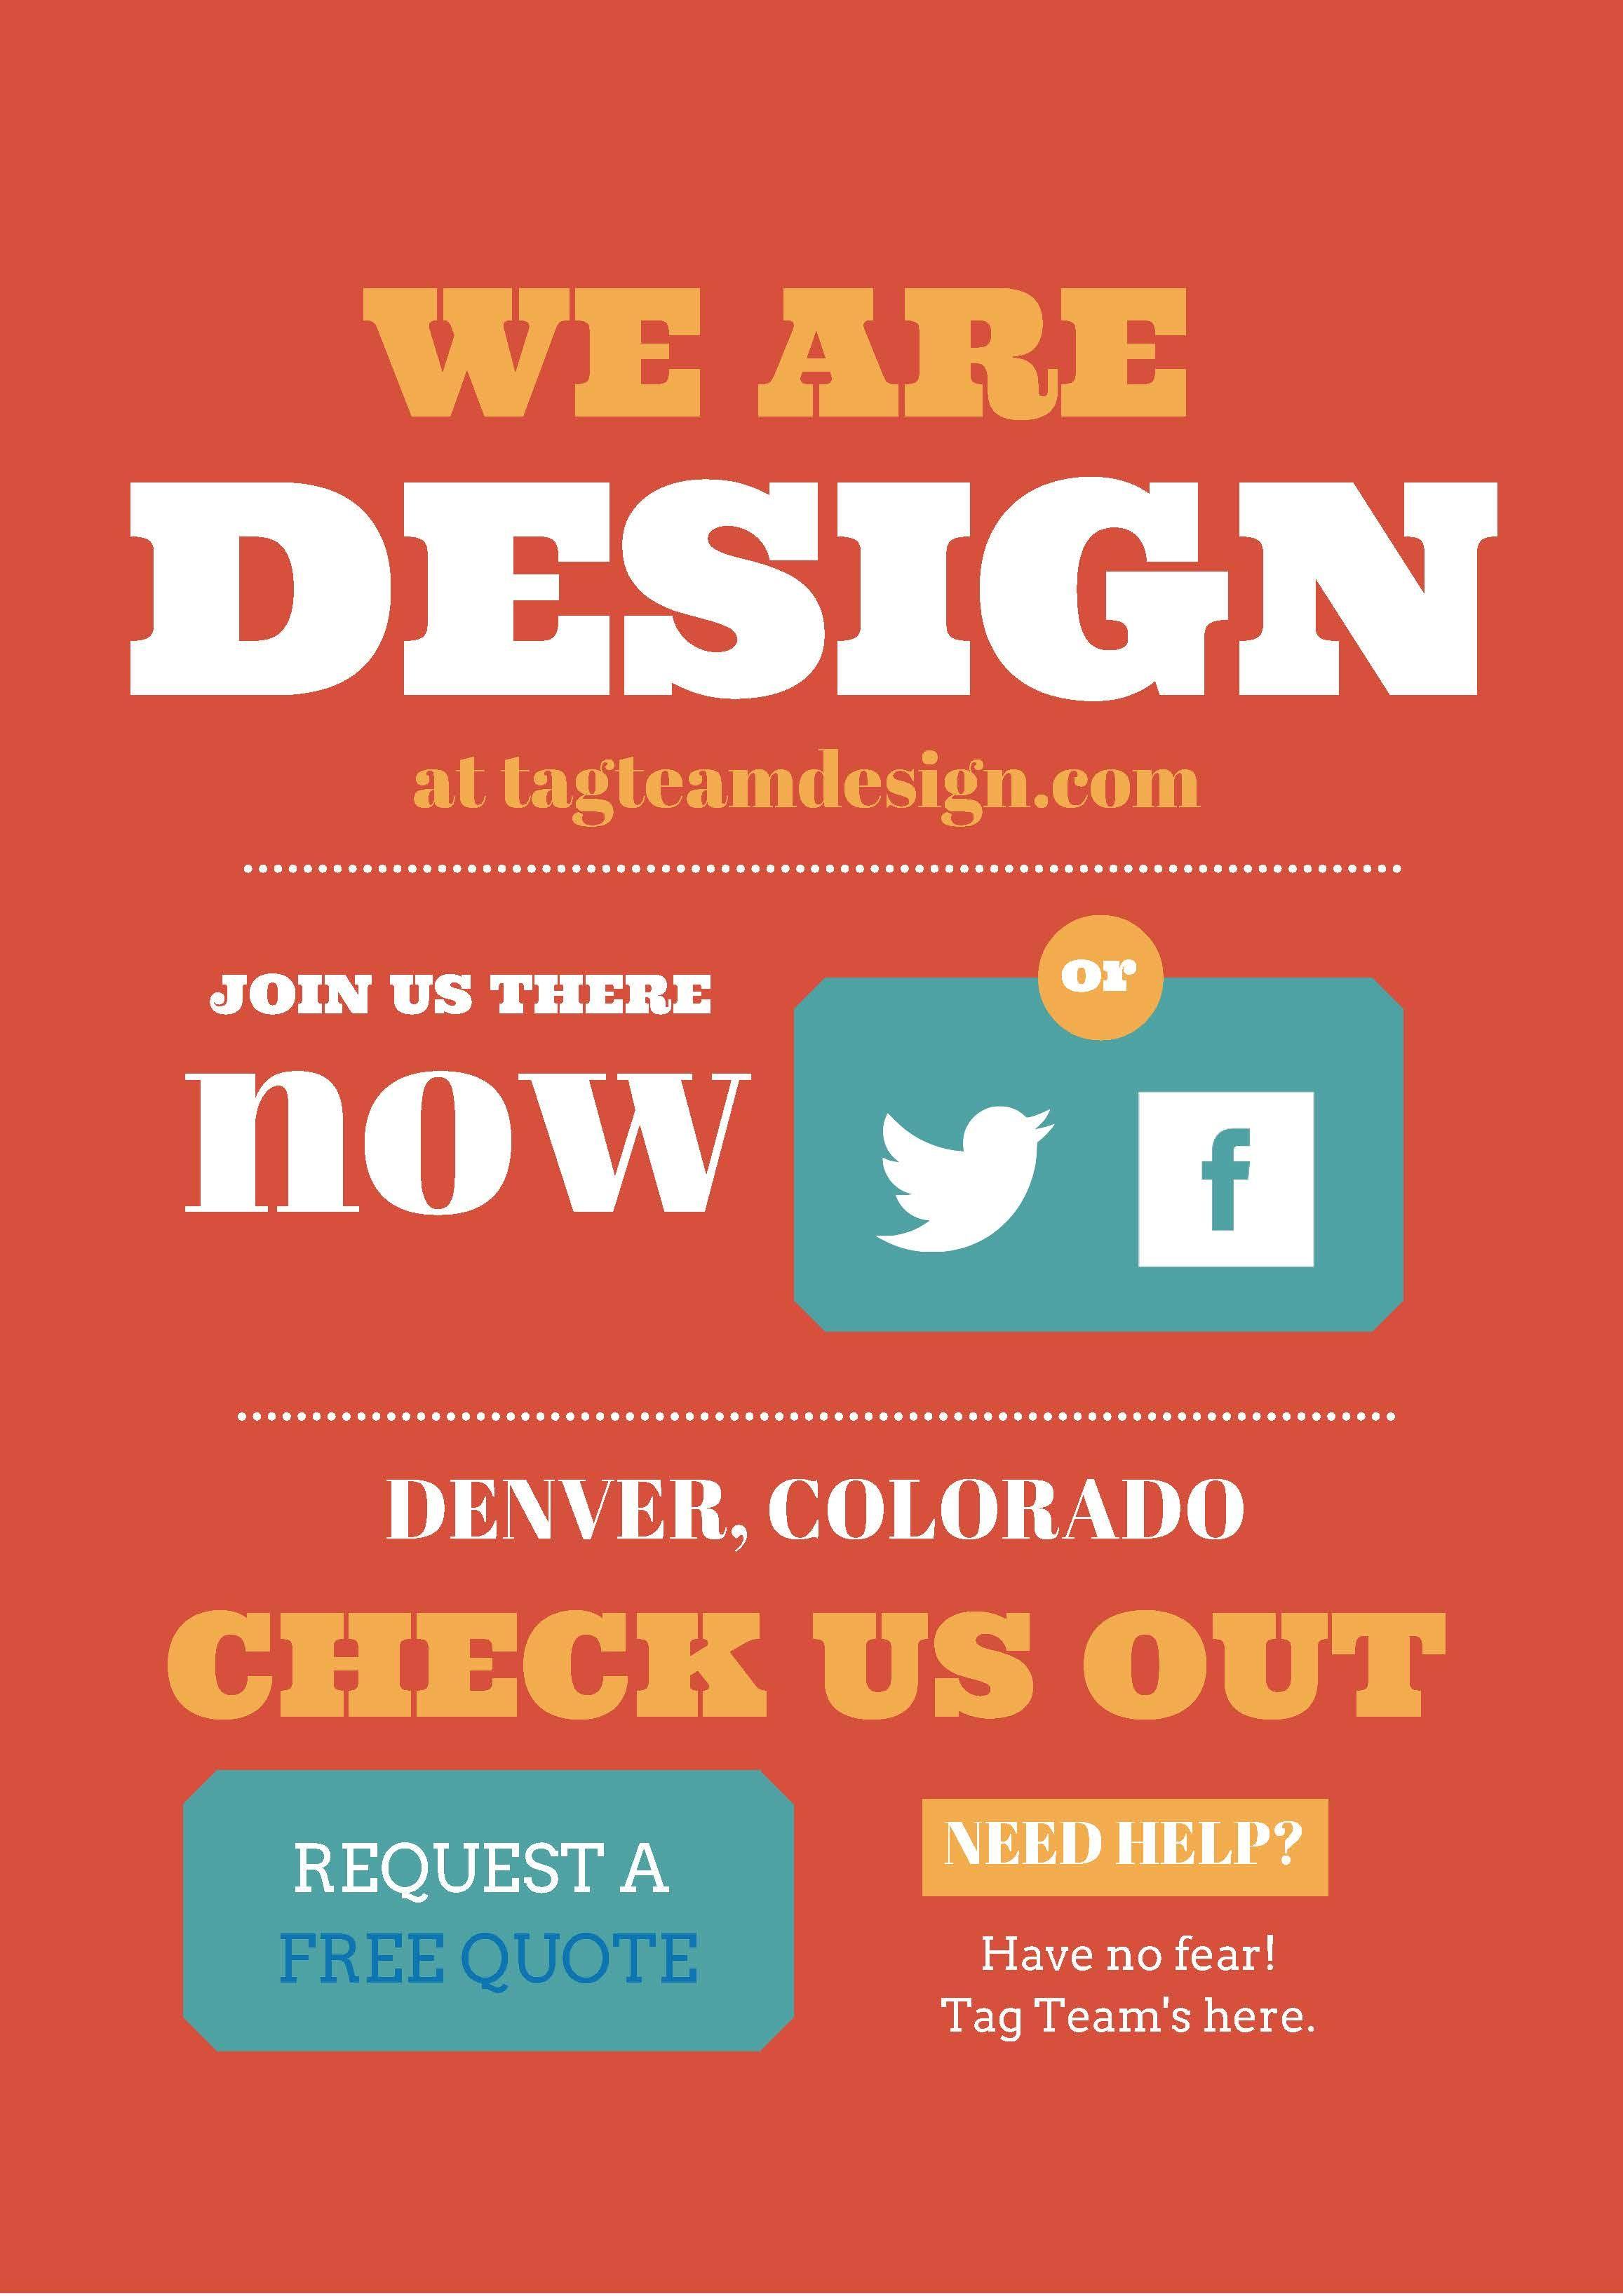 We are the Tag Team. Web design, Seo